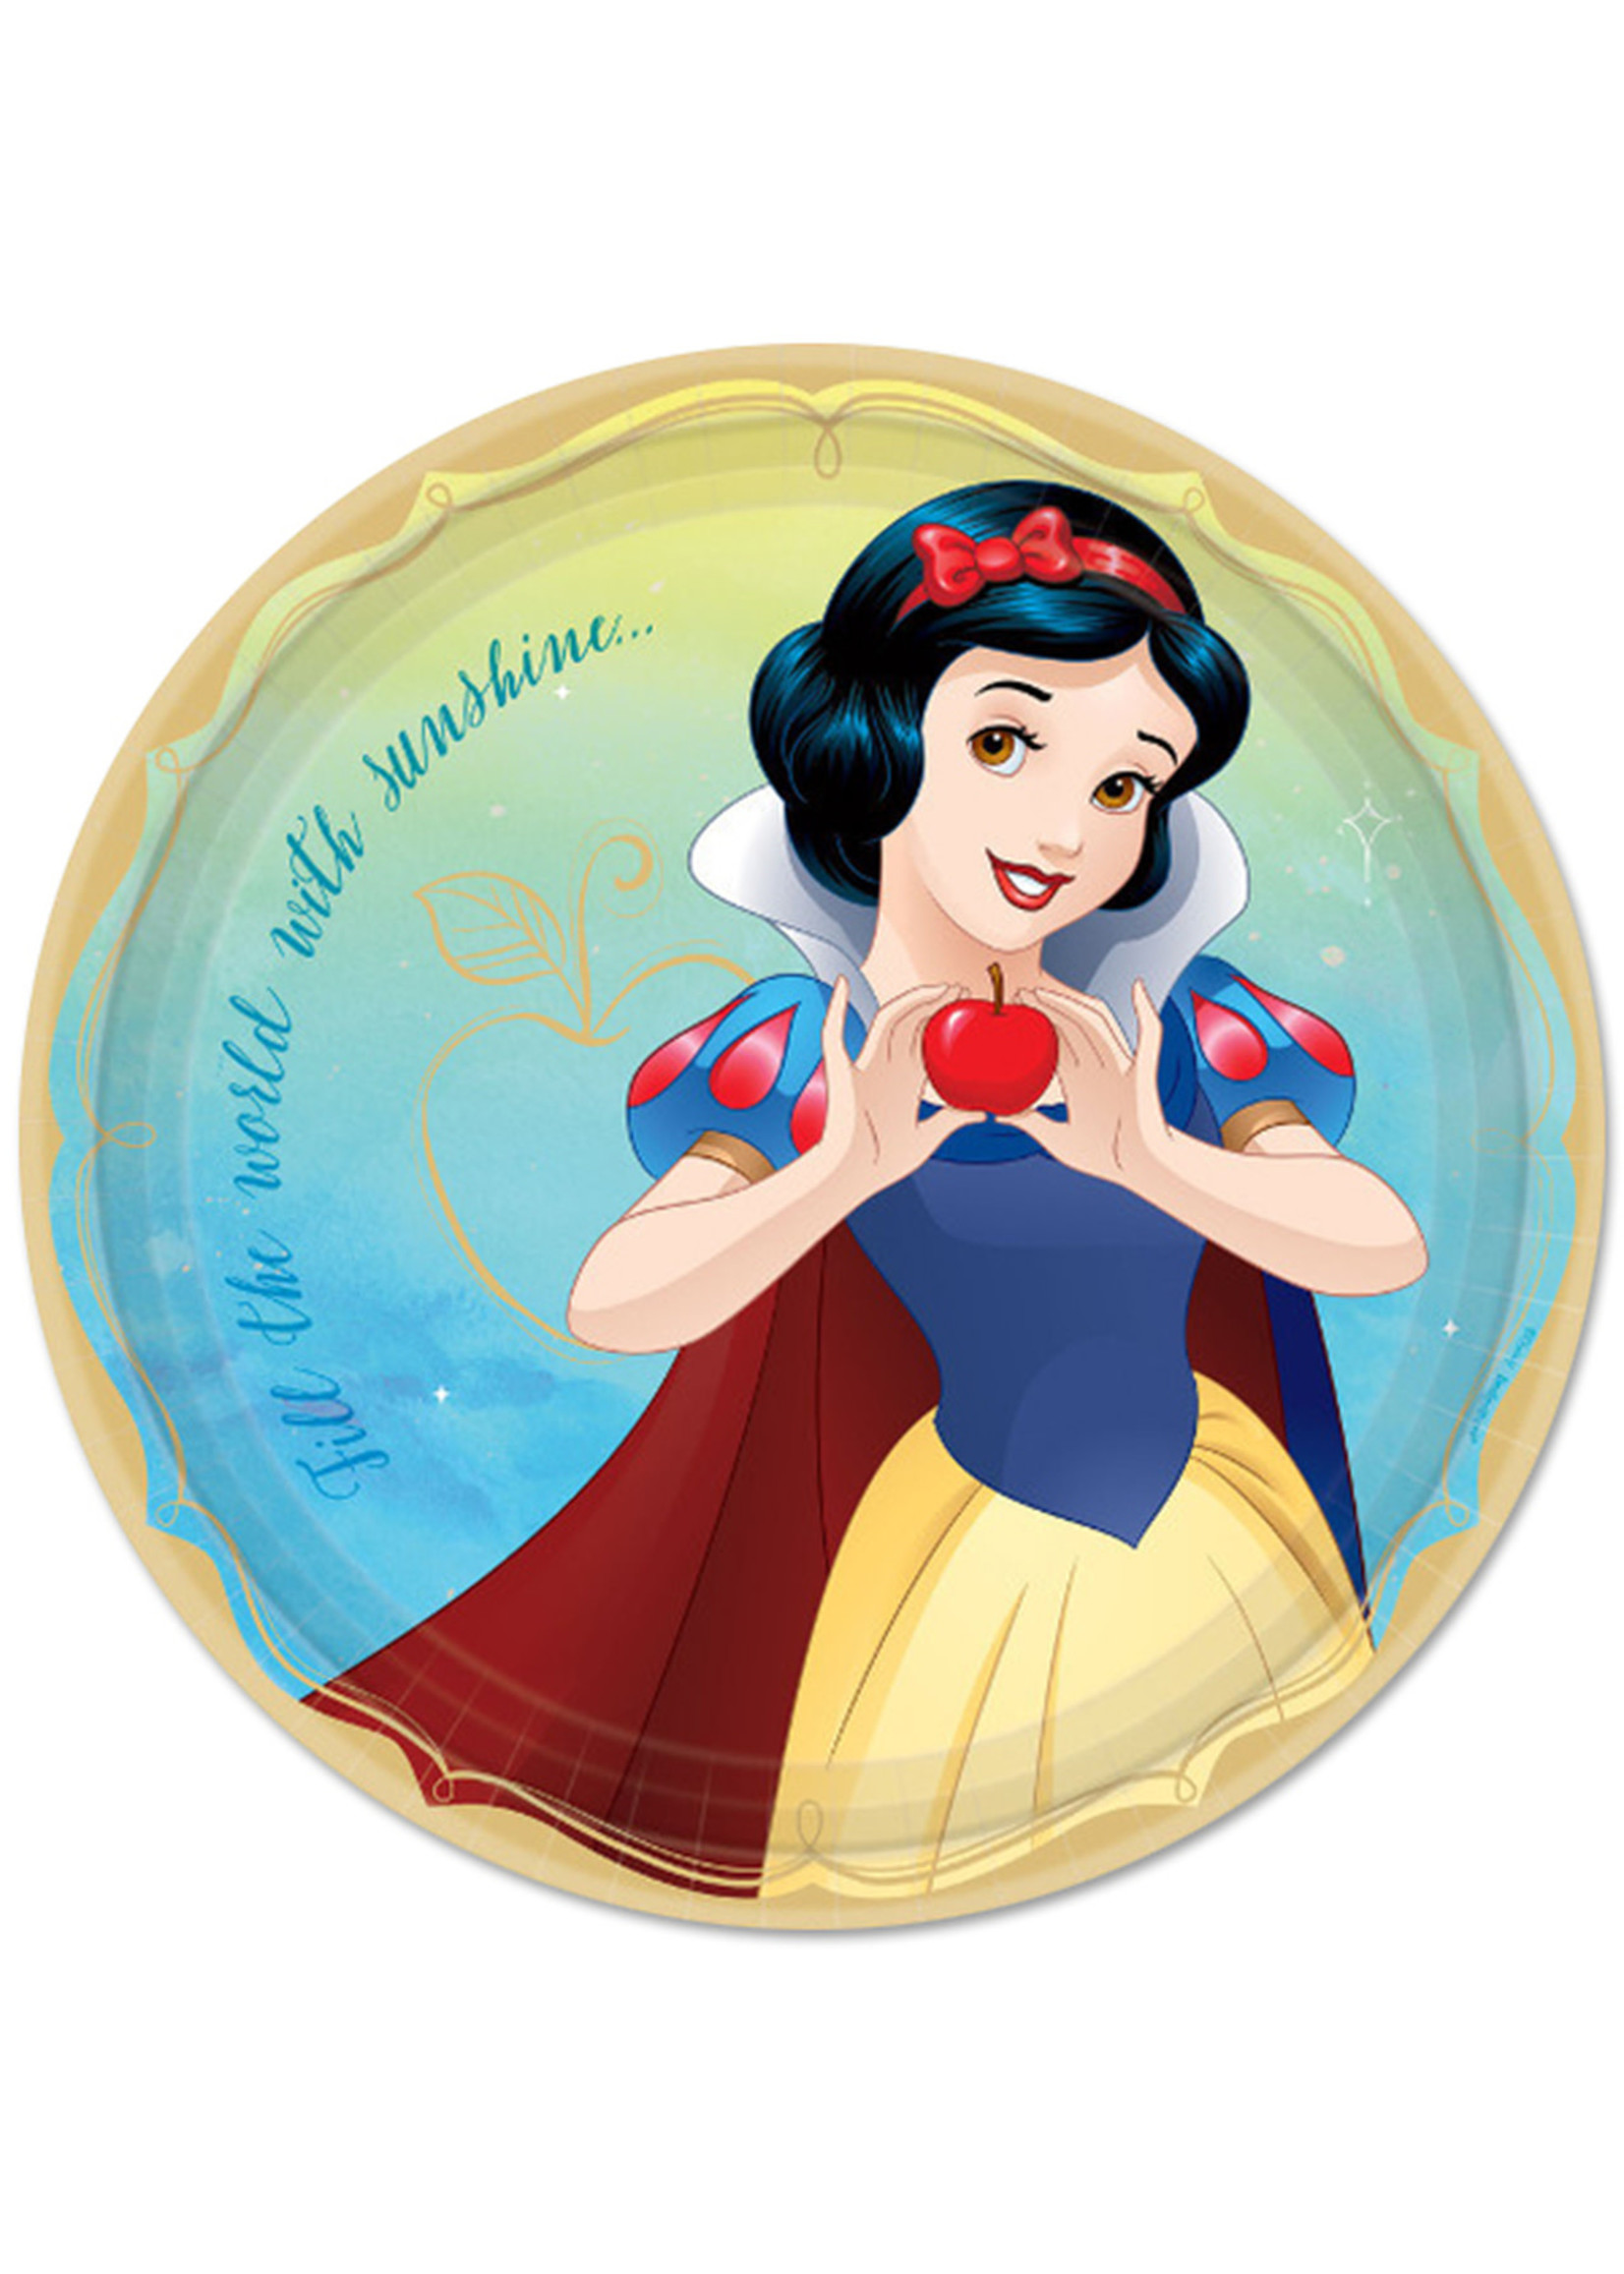 Disney Princess Snow White 9in Plates - 8ct